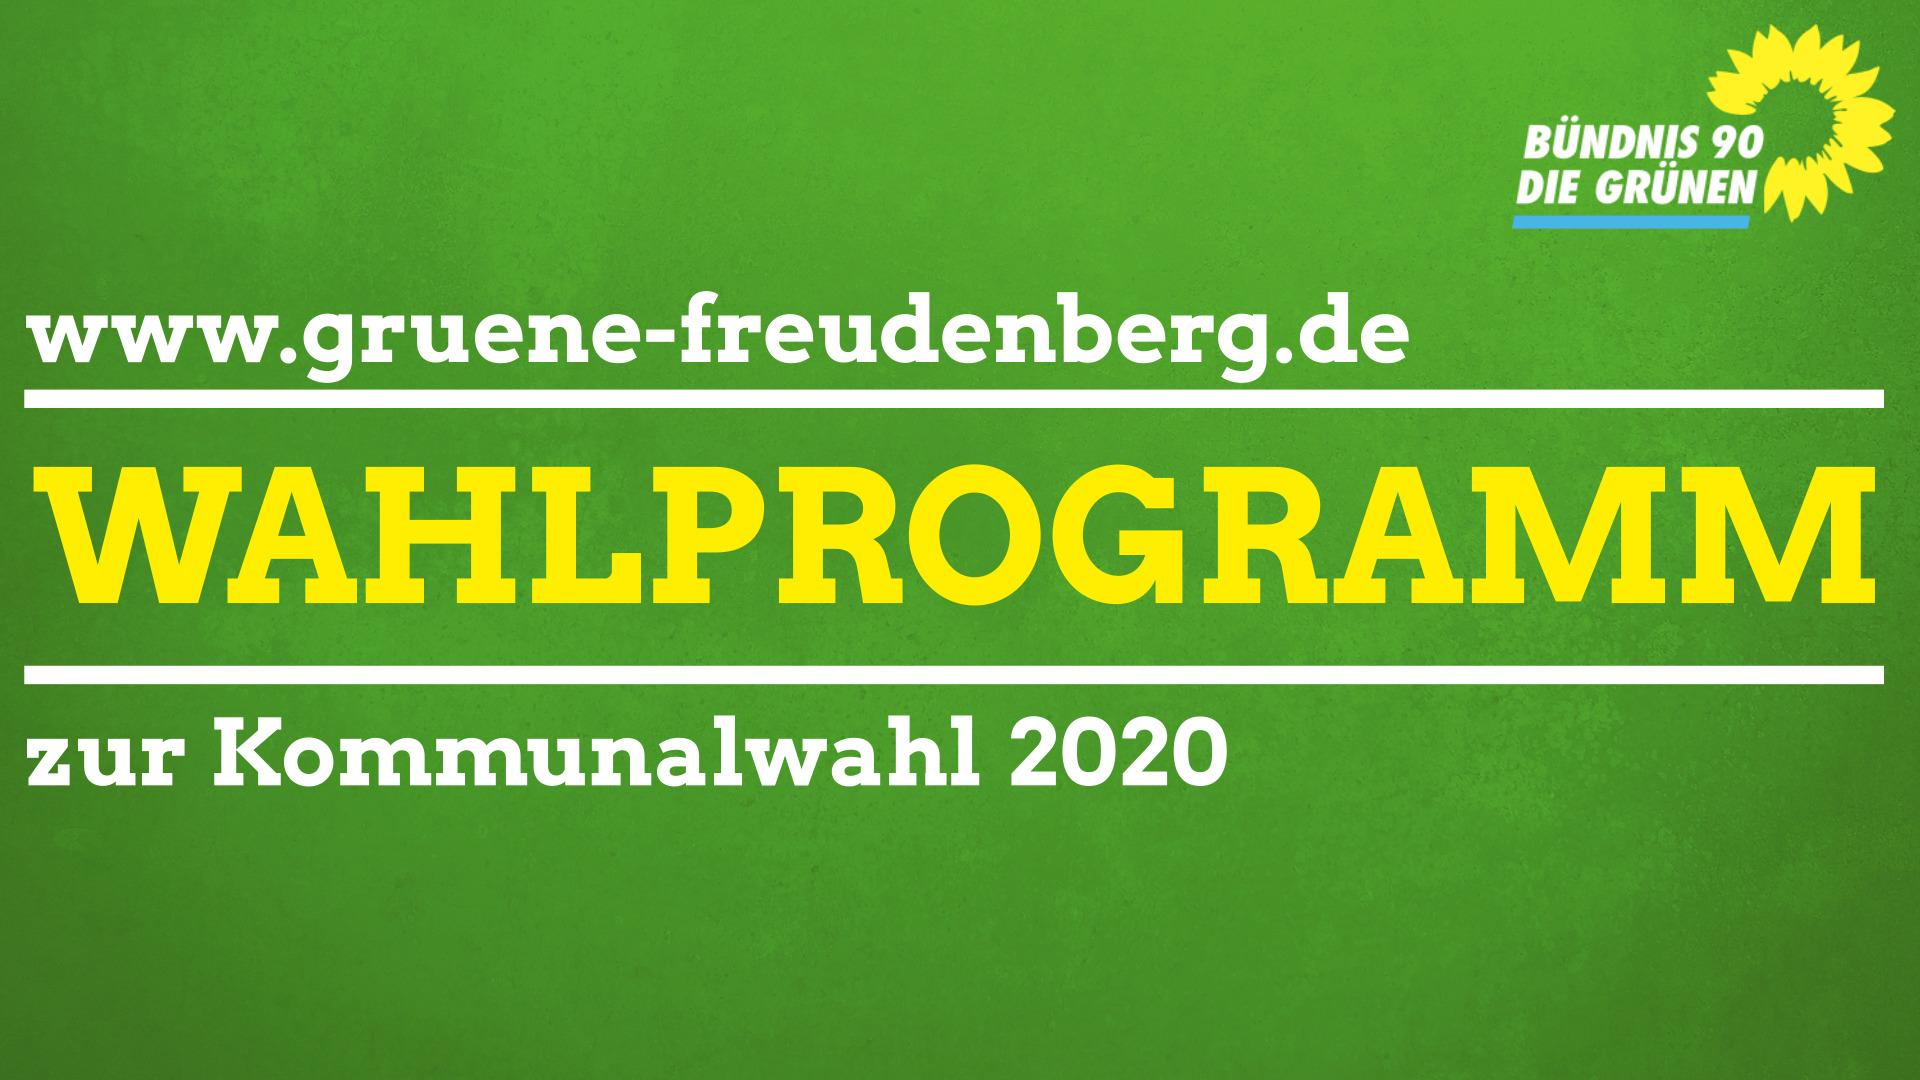 Wahlprogramm der Freudenberger Bündnis-Grünen zur Kommunalwahl 2020